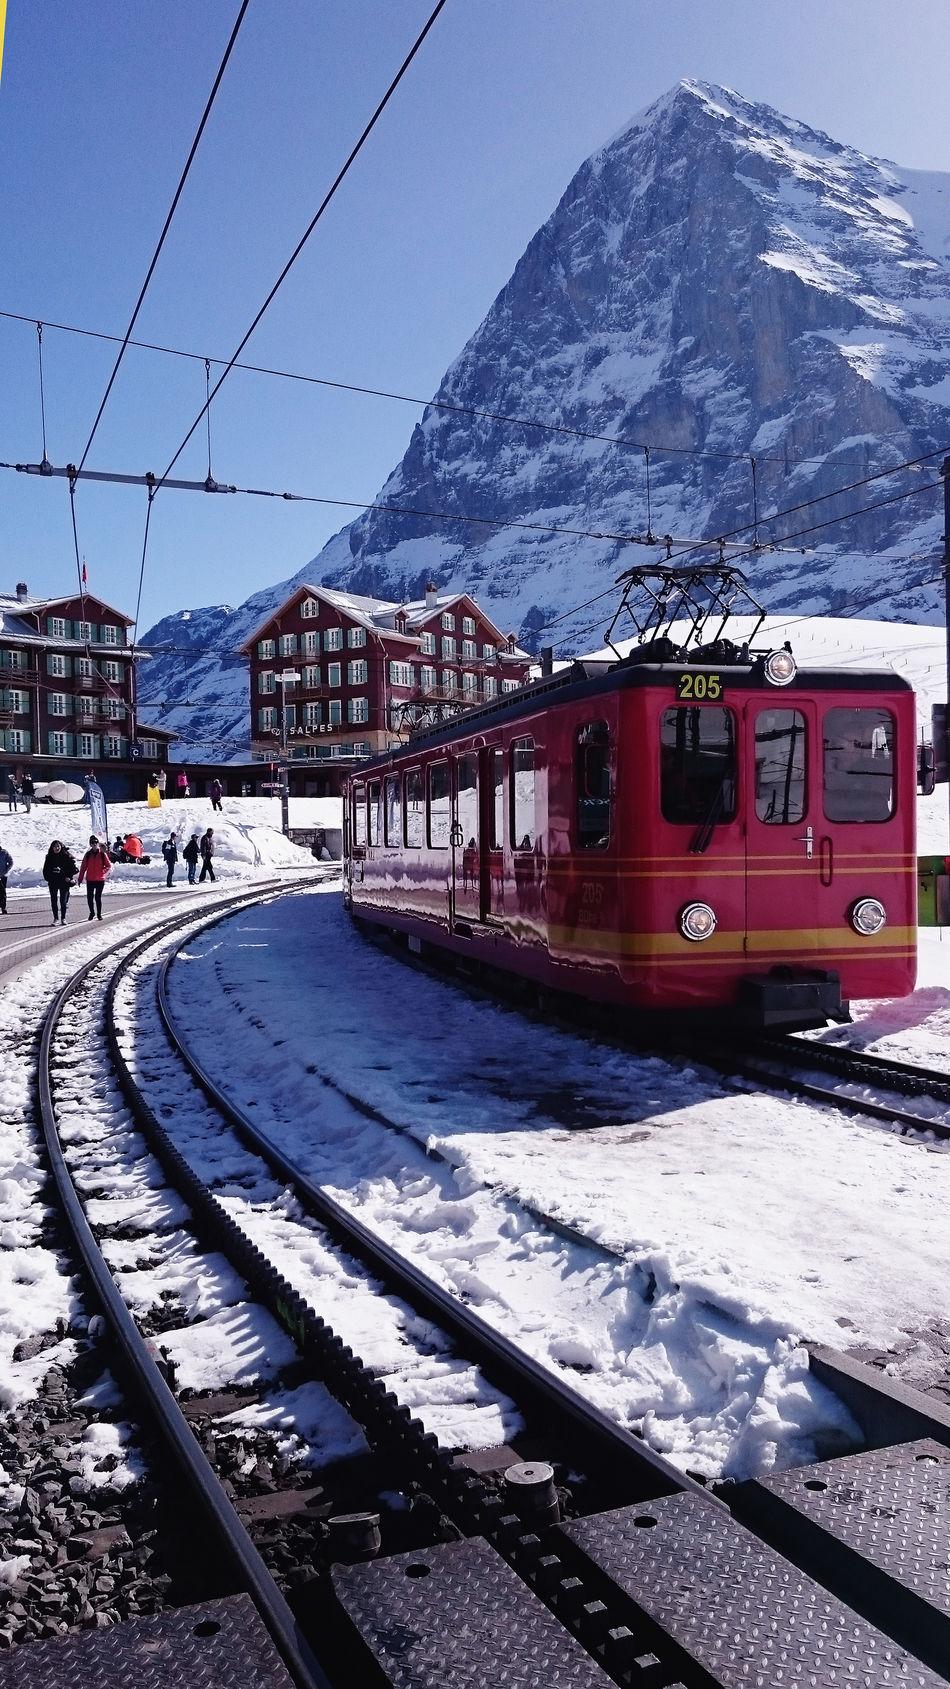 Cable Car Cold Temperature Day Jungfrau Mode Of Transport Overhead Cable Car Public Transportation Rail Transportation Railroad Track Snow Swizterland Tram Transportation